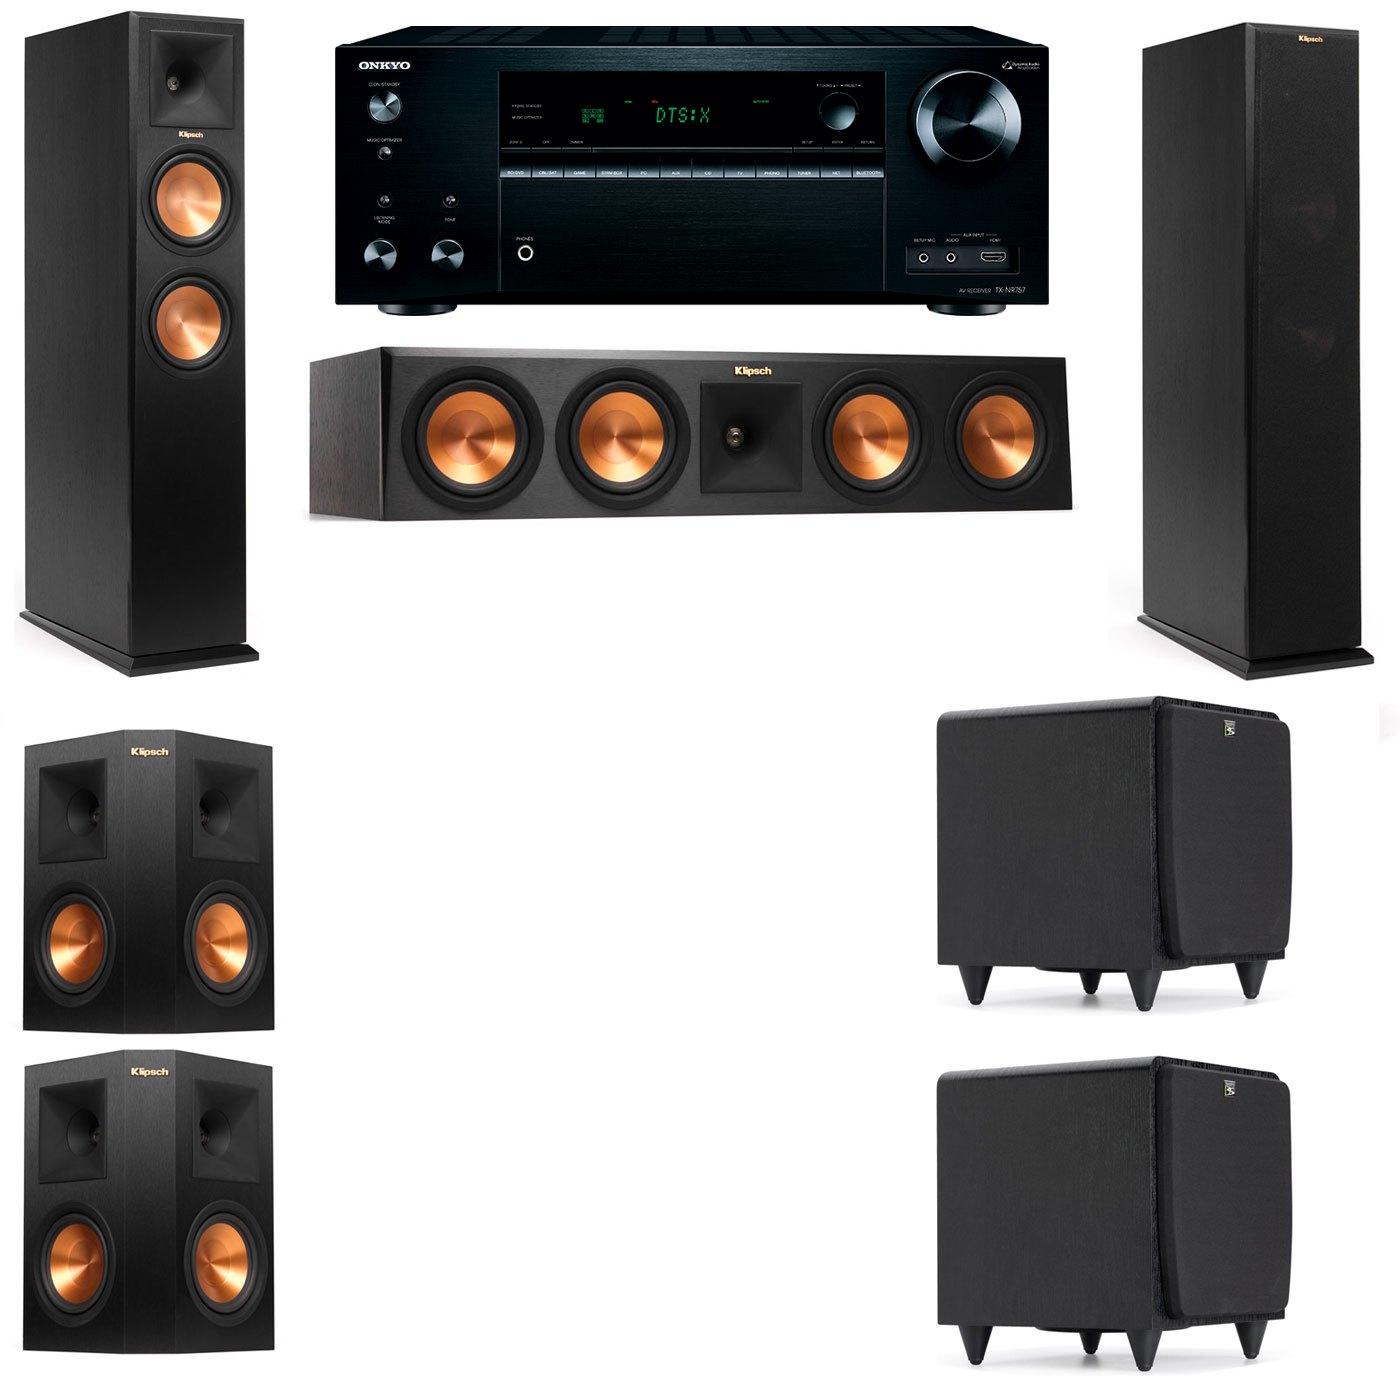 Klipsch RP-250F Tower Speakers-SDS12-5.2-Onkyo TX-NR757